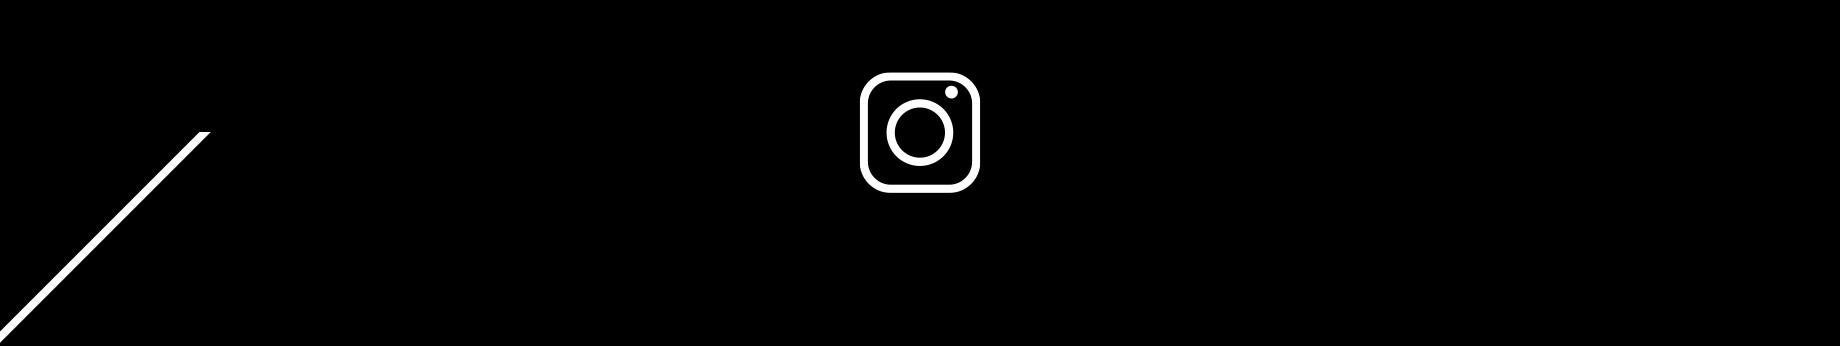 HUCKSTER instagram bg top